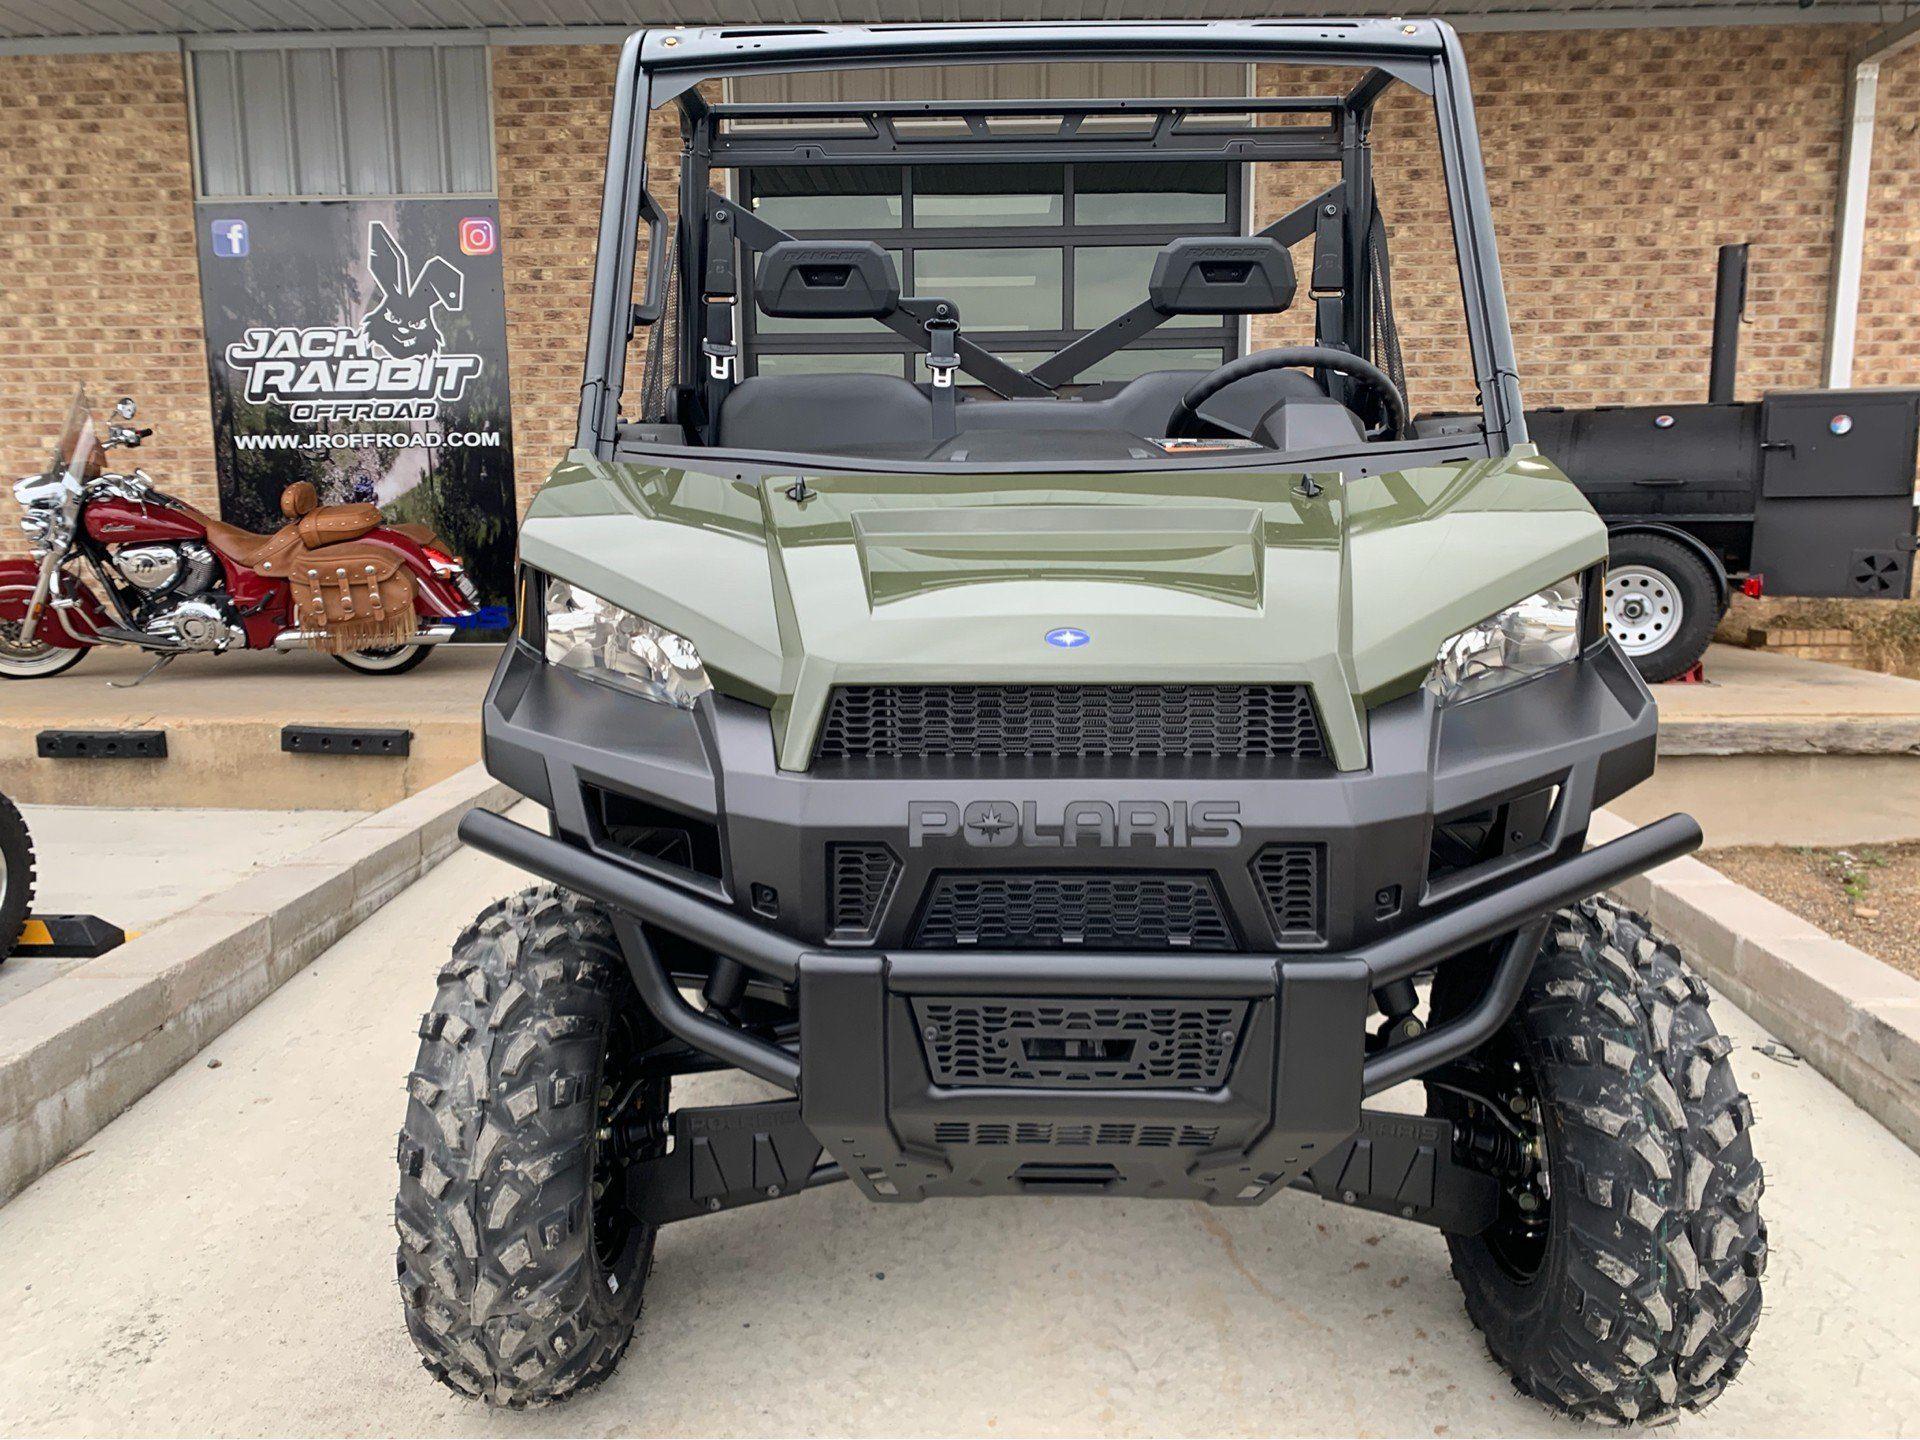 new 2018 polaris ranger diesel utility vehicles in. Black Bedroom Furniture Sets. Home Design Ideas